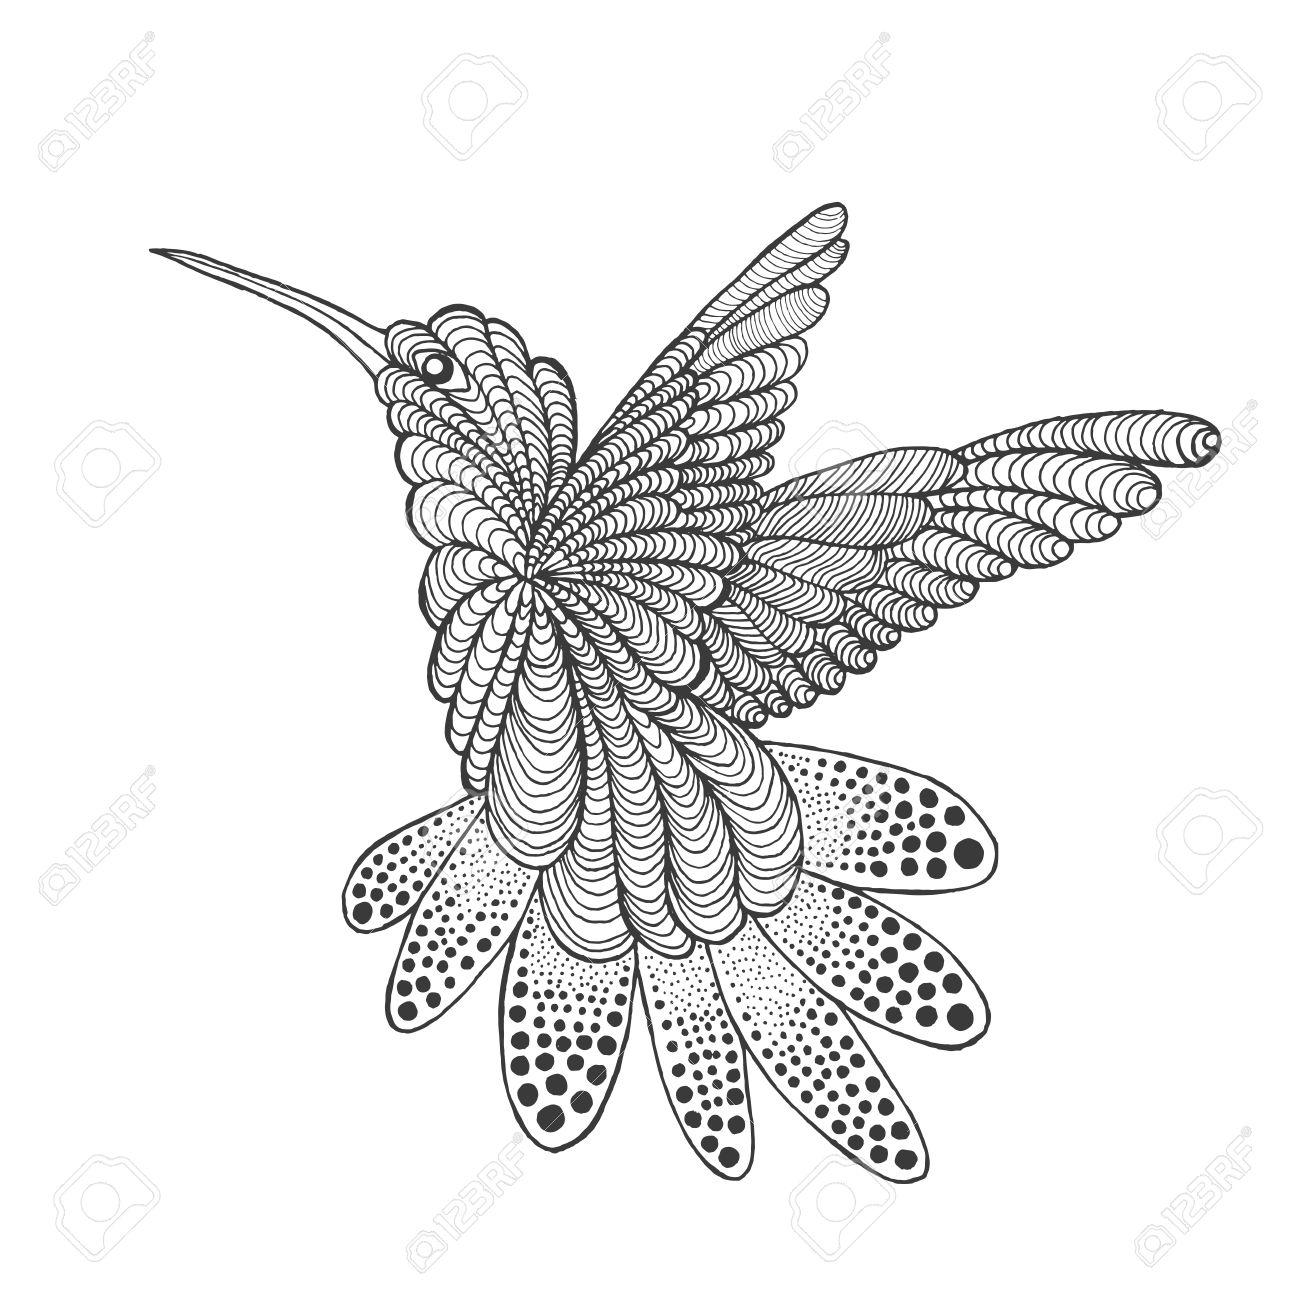 1300x1300 Zentangle Stylized Hummingbird. Animals. Black White Hand Drawn